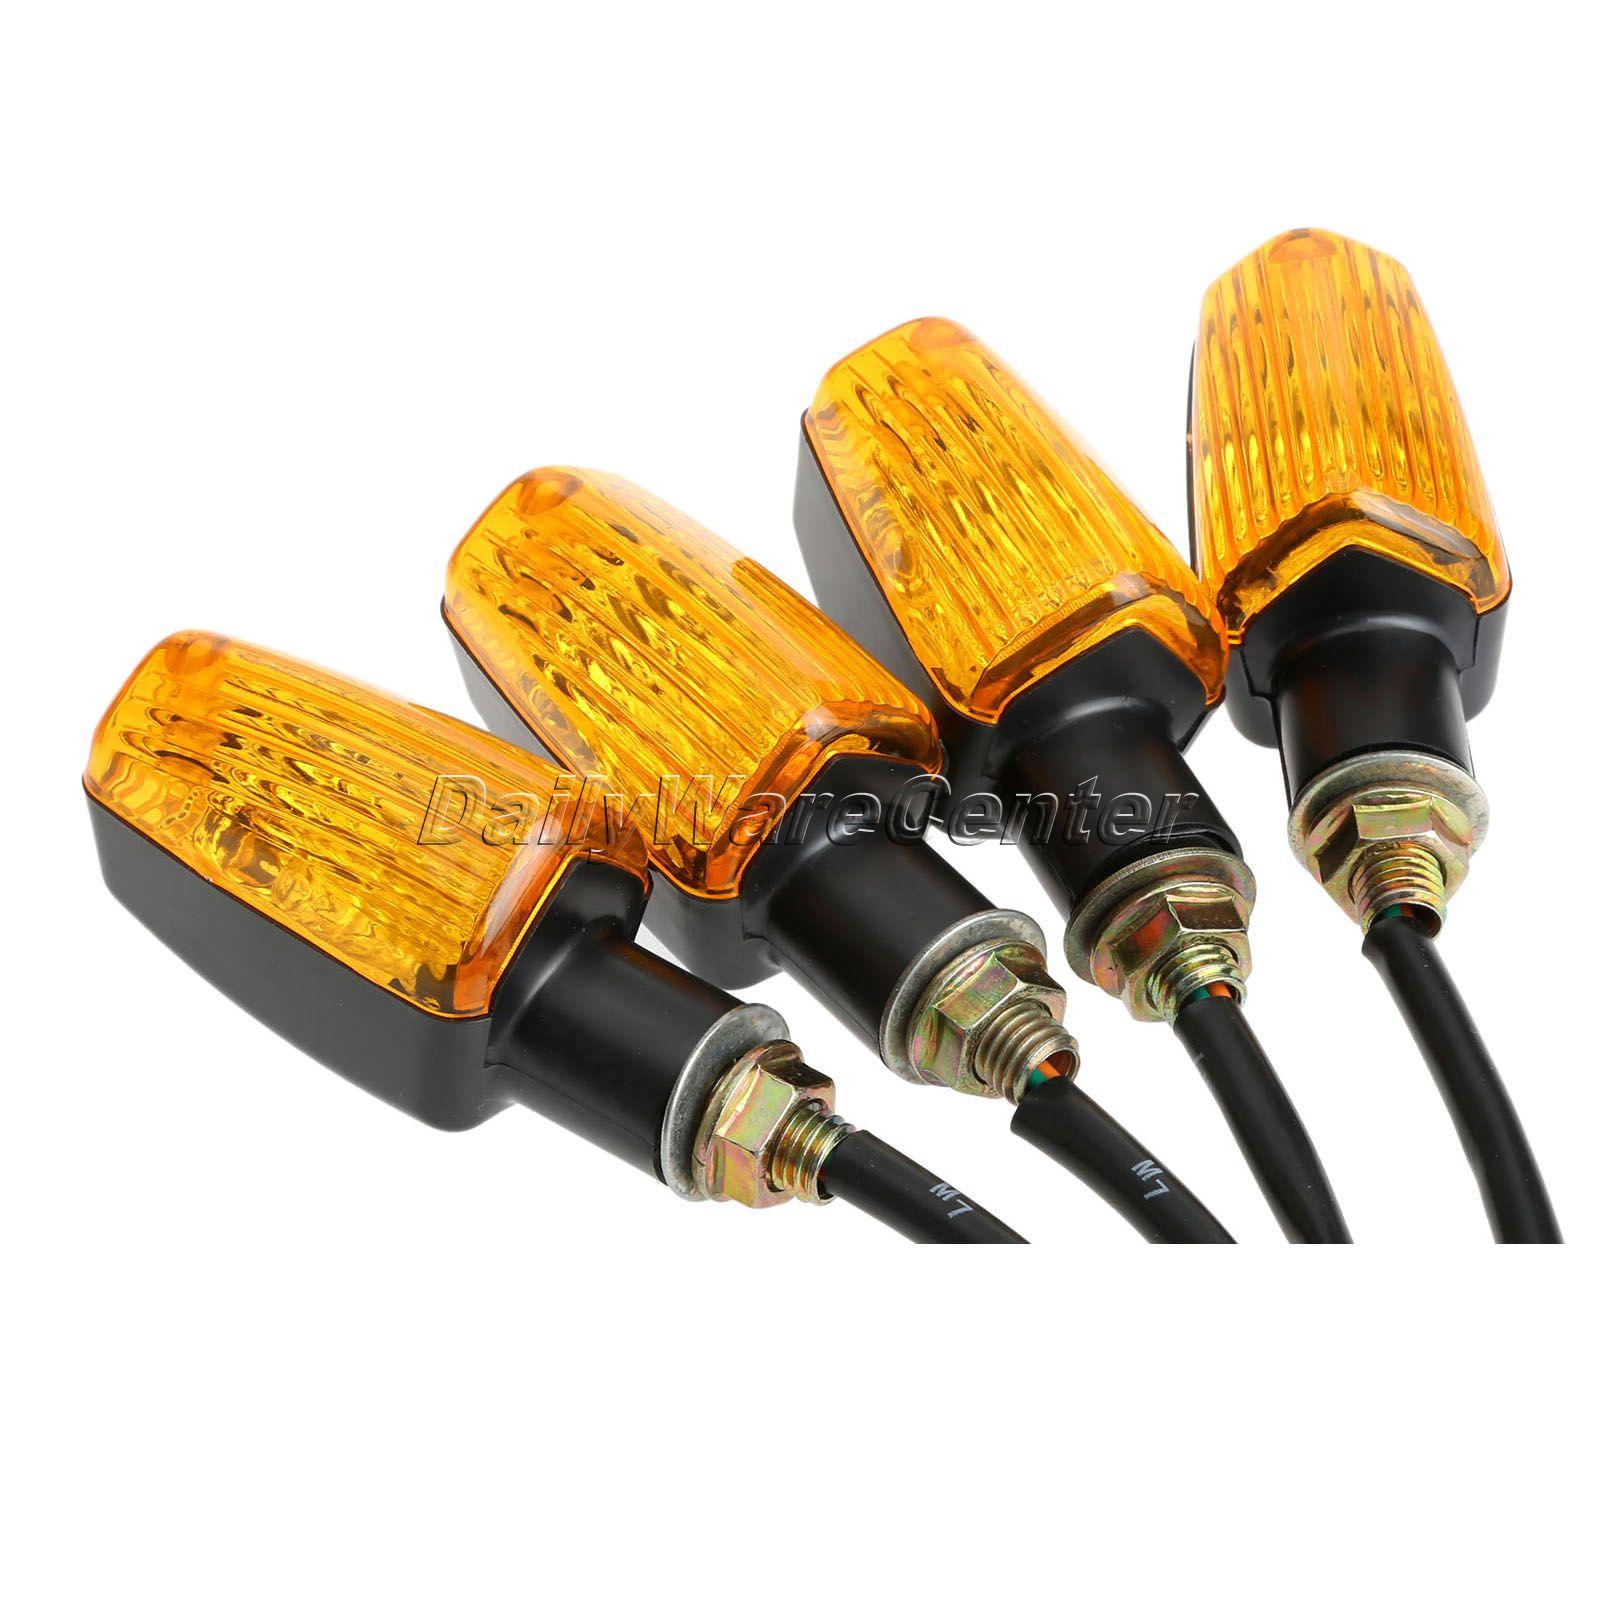 4Pcs set 12V Universal Motorcycle Turn Signal Indicator Light Turning Amber font b Lamp b font